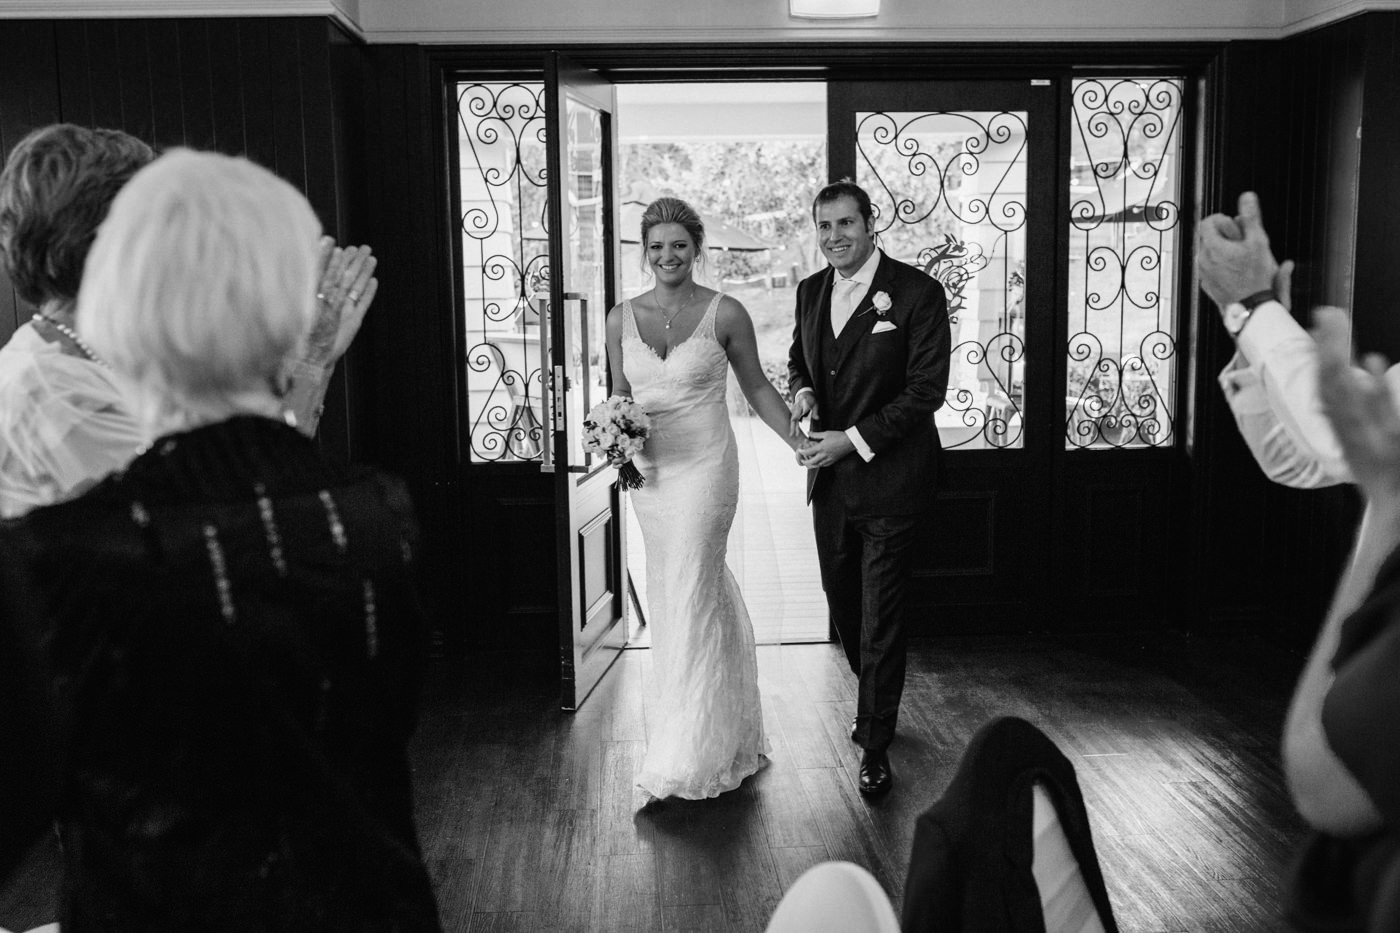 bracu_wedding_photos1069.jpg